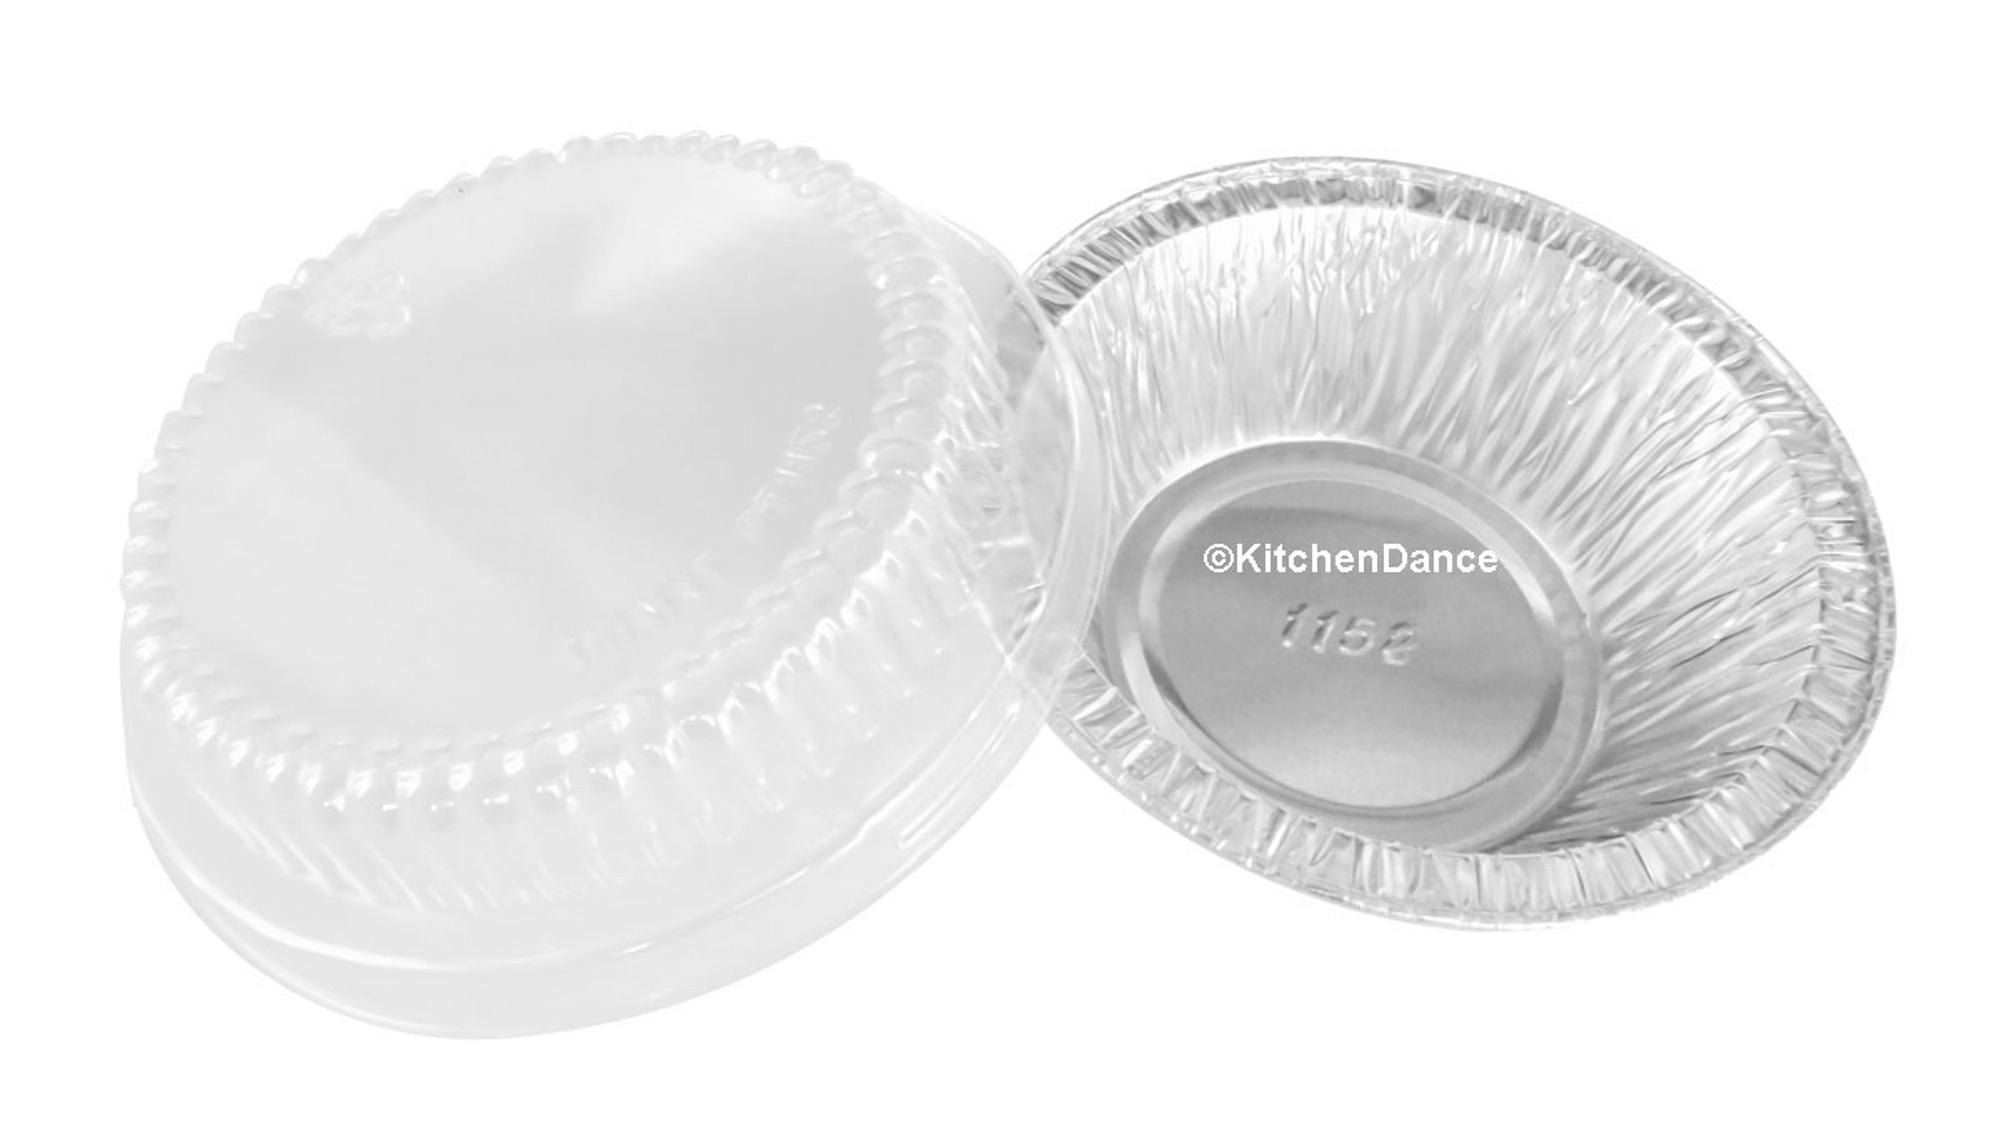 4 Quot Deep Foil Tart Pan W Plastic Lid